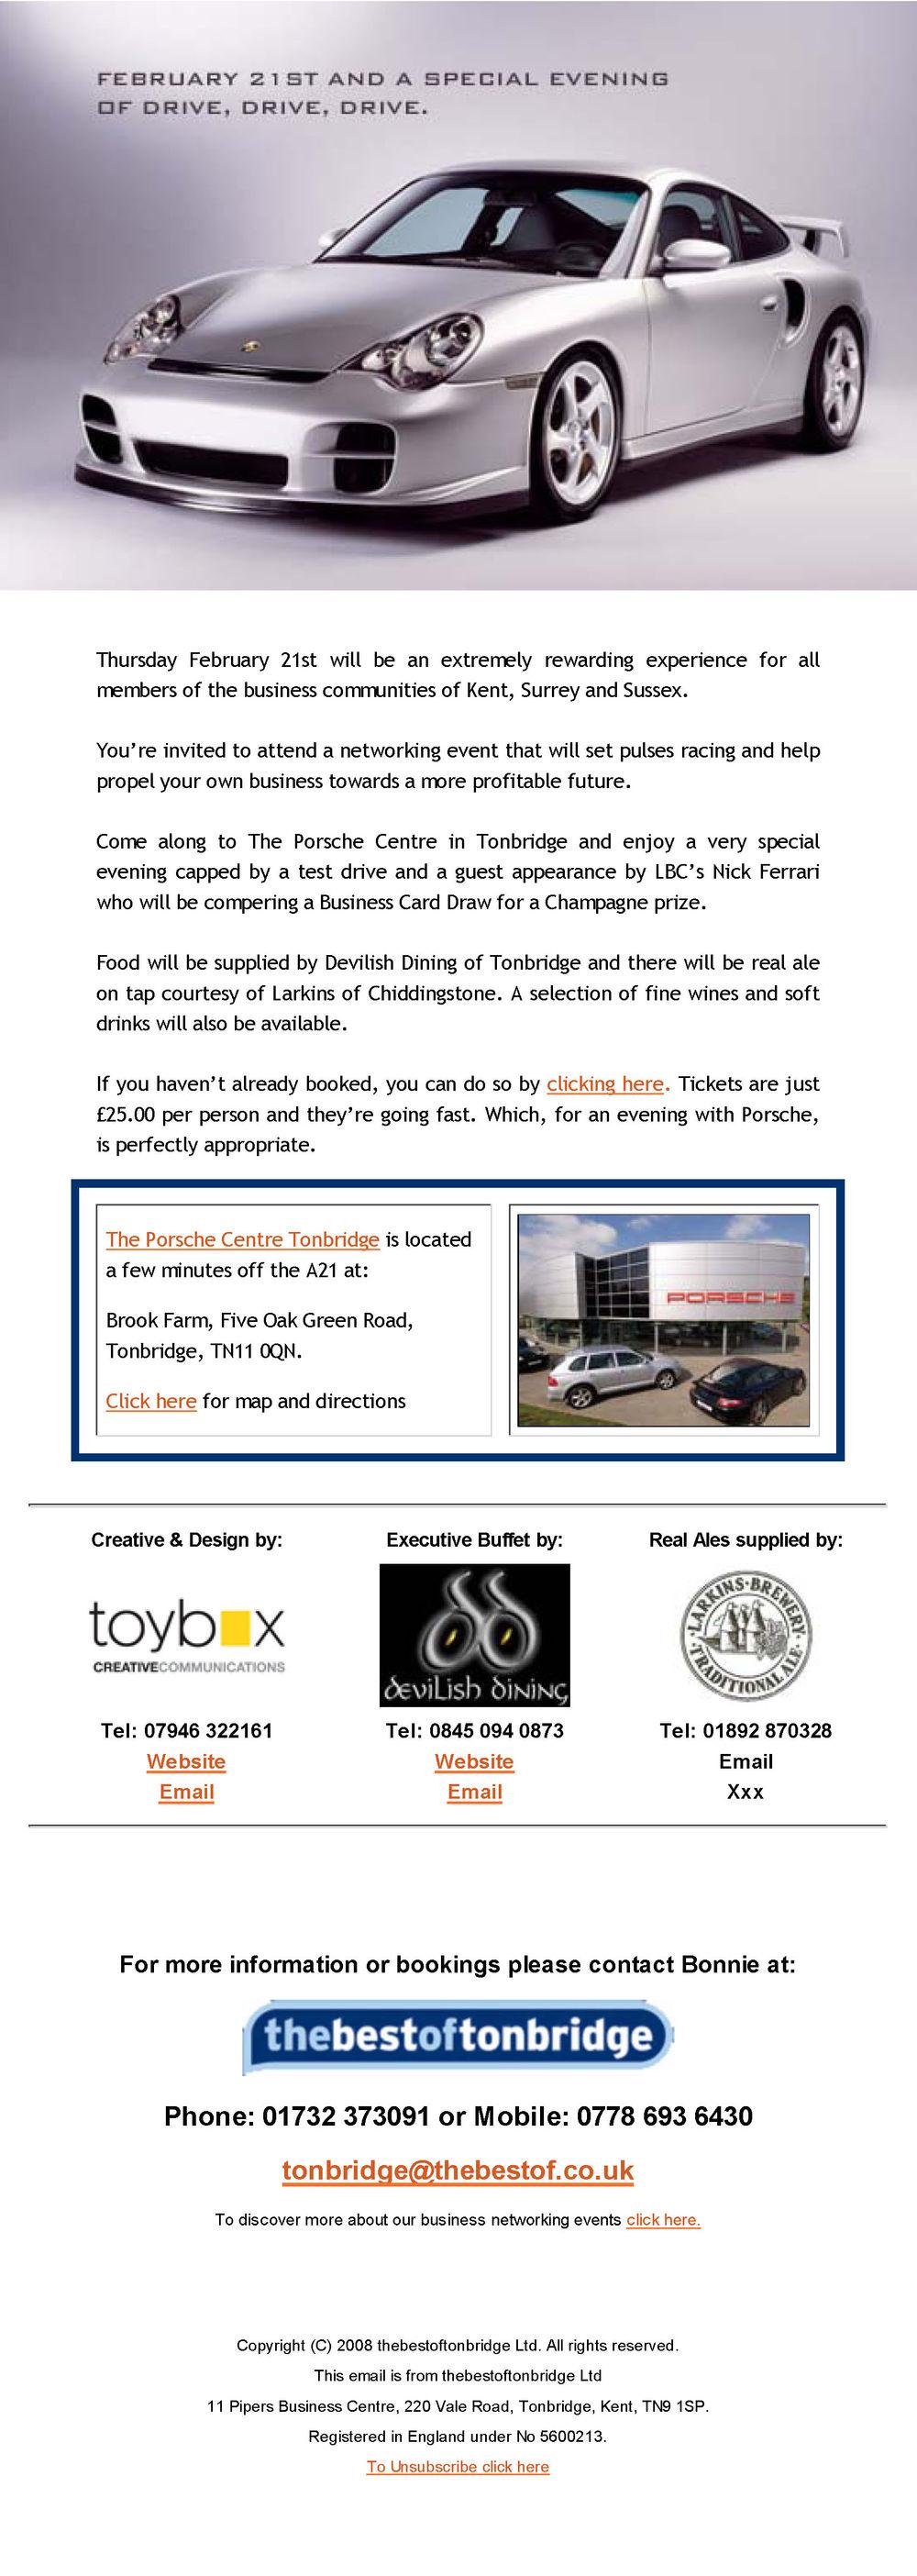 toybox_creative_porsche_best_of_tonbridge_email_campaign_Page_2.jpg